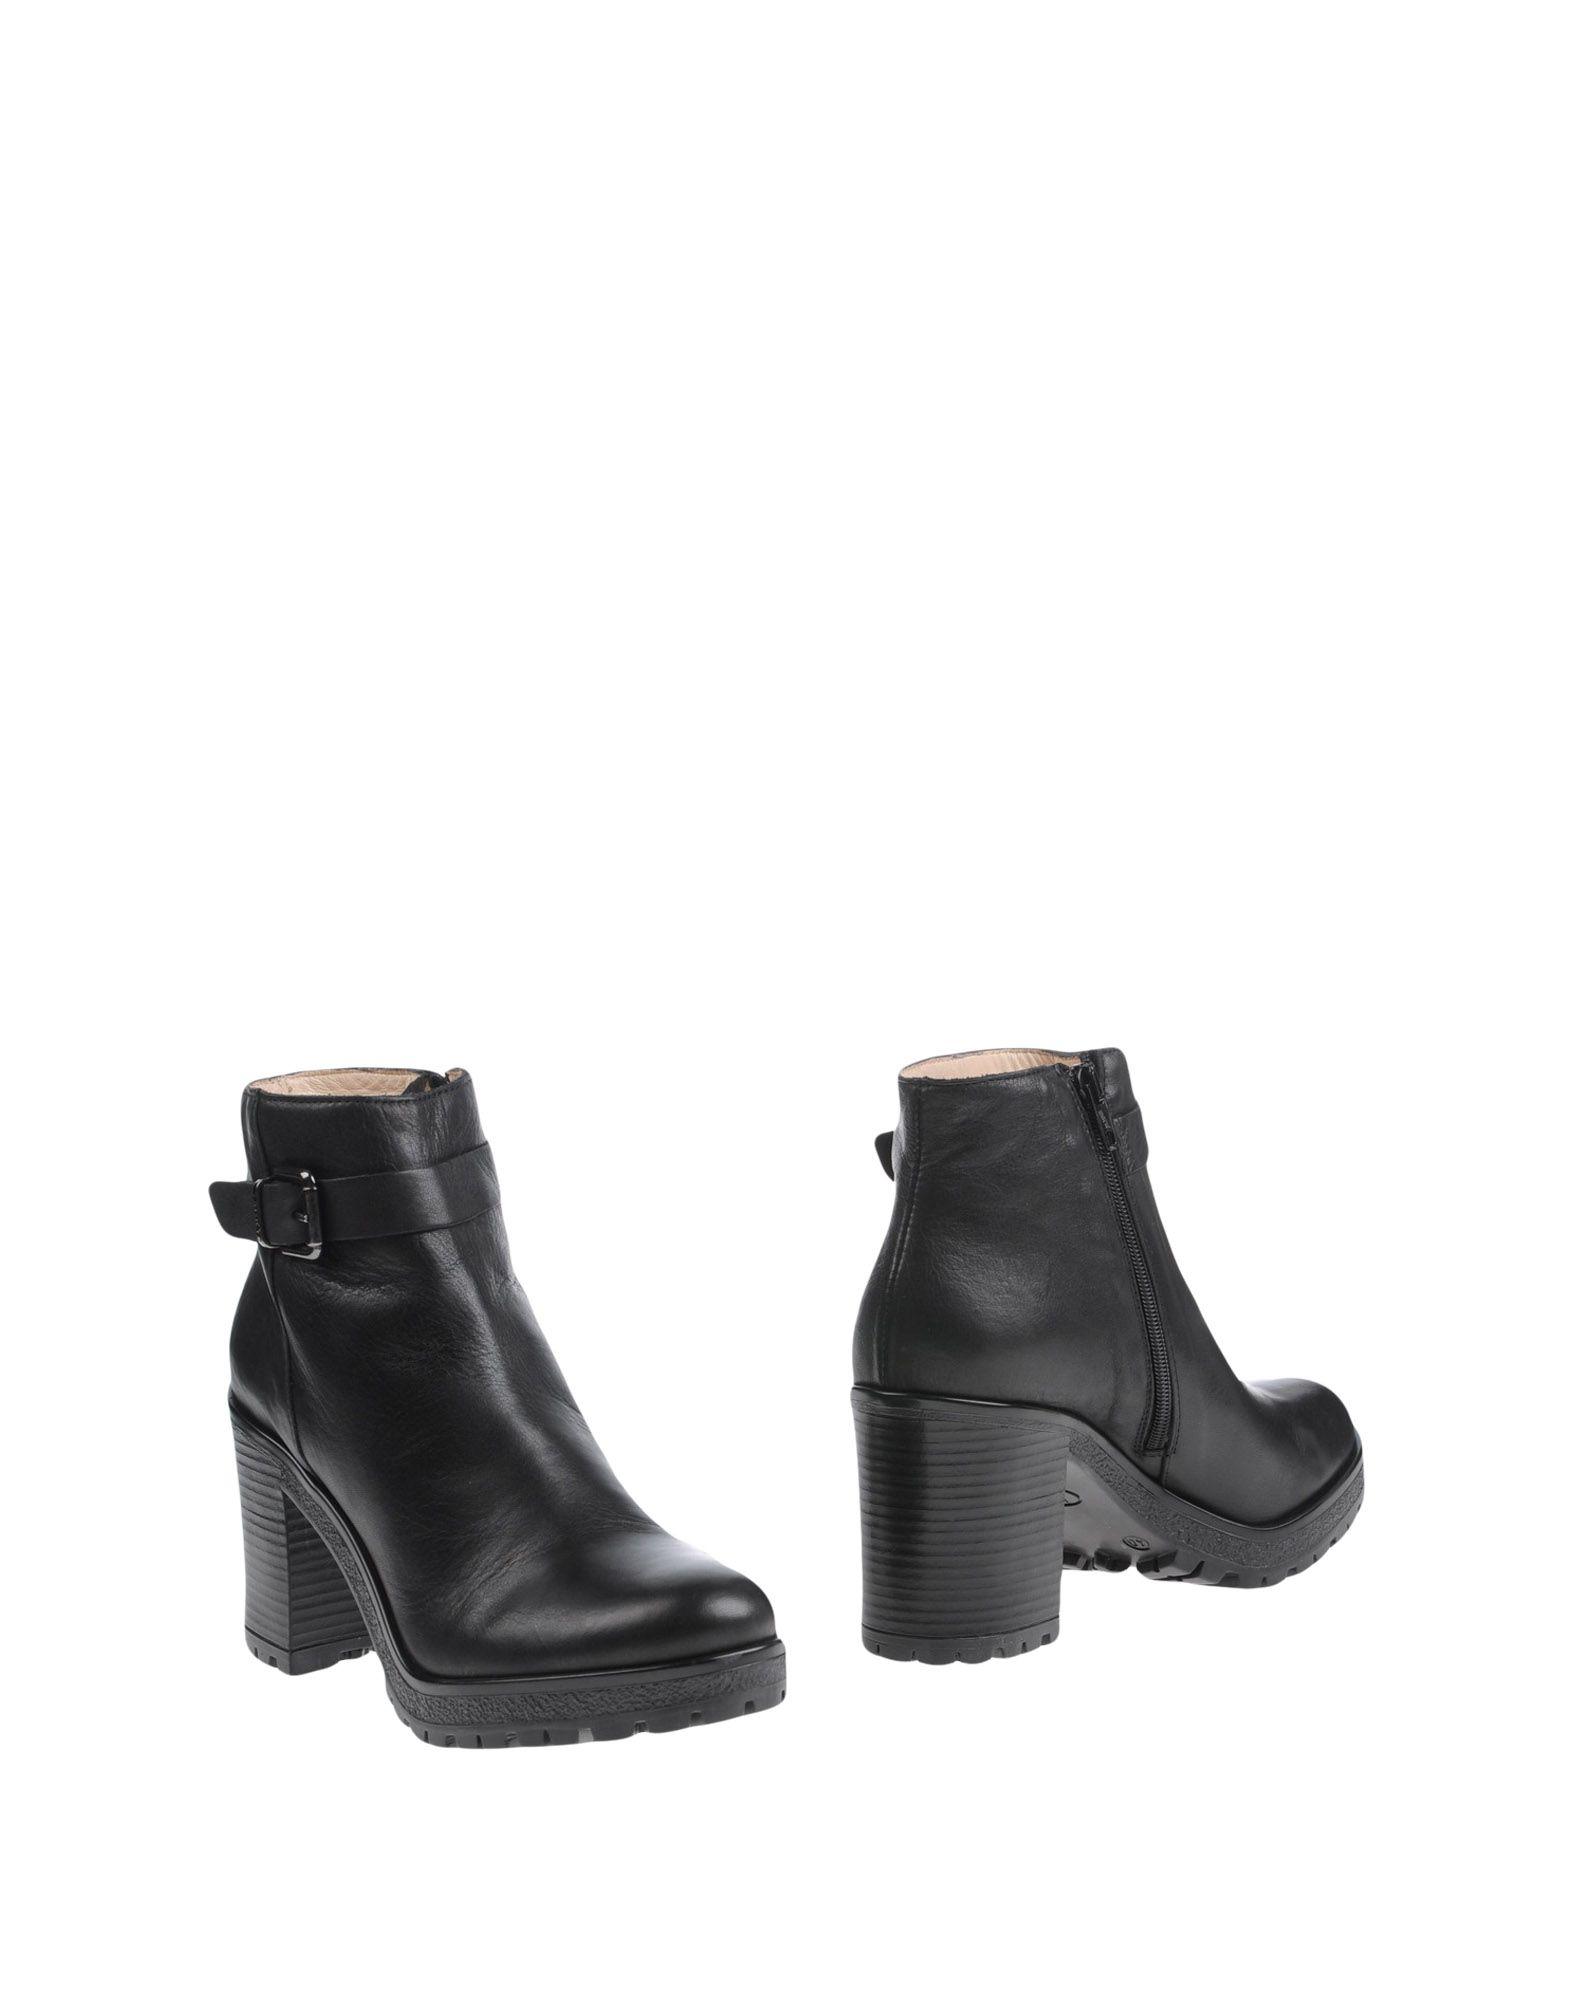 Liu •Jo Shoes Stiefelette Damen  11179850HK Gute Qualität beliebte Schuhe